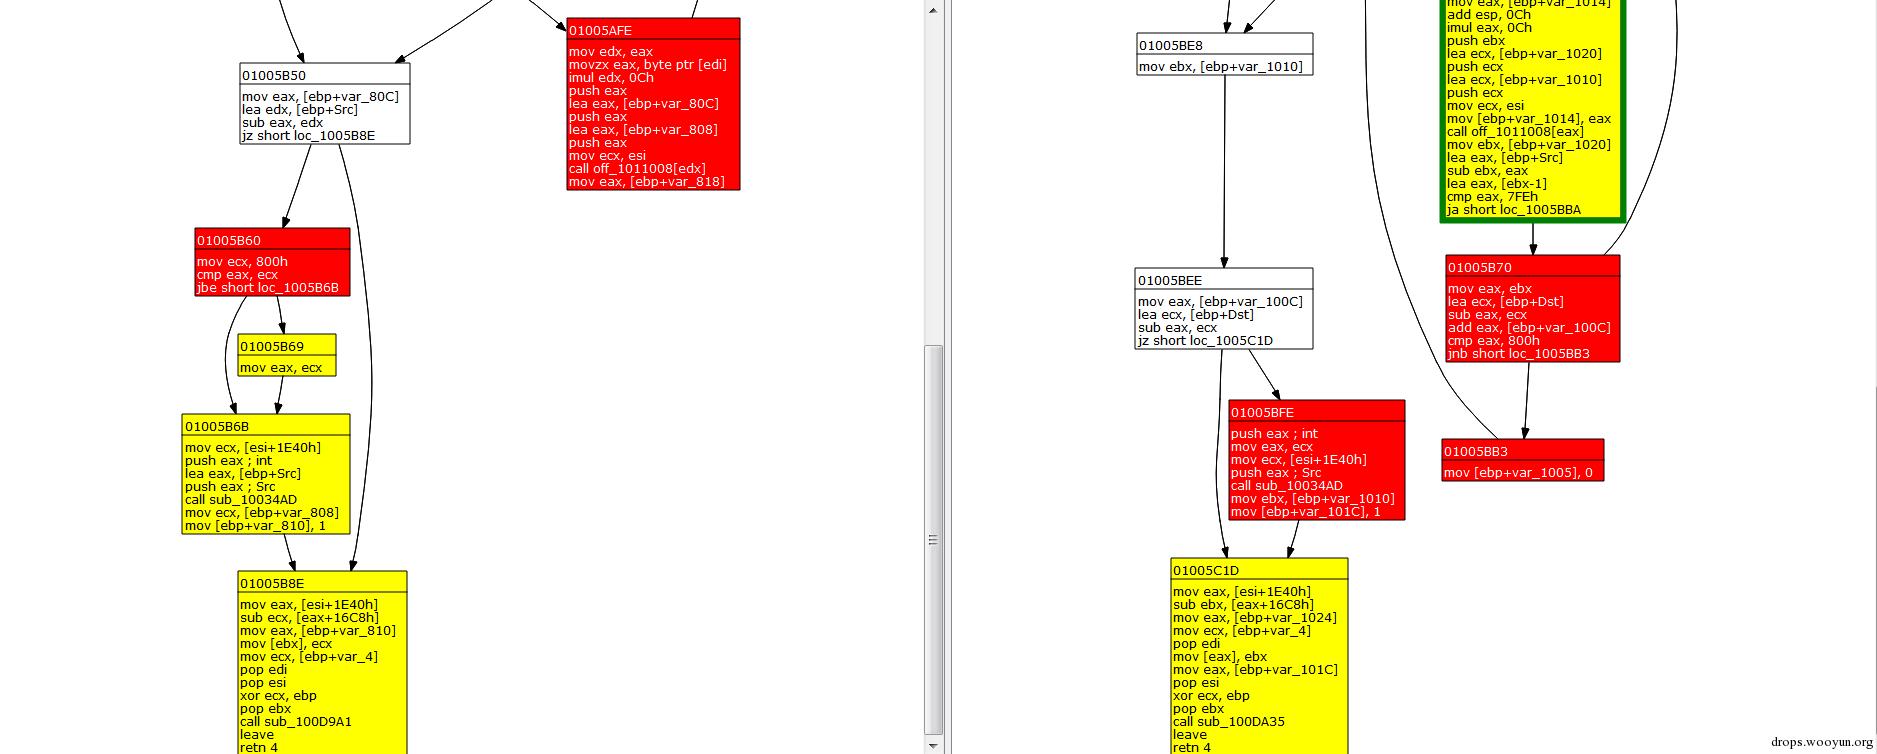 MS15-002 telnet服务缓冲区溢出漏洞分析与POC构造